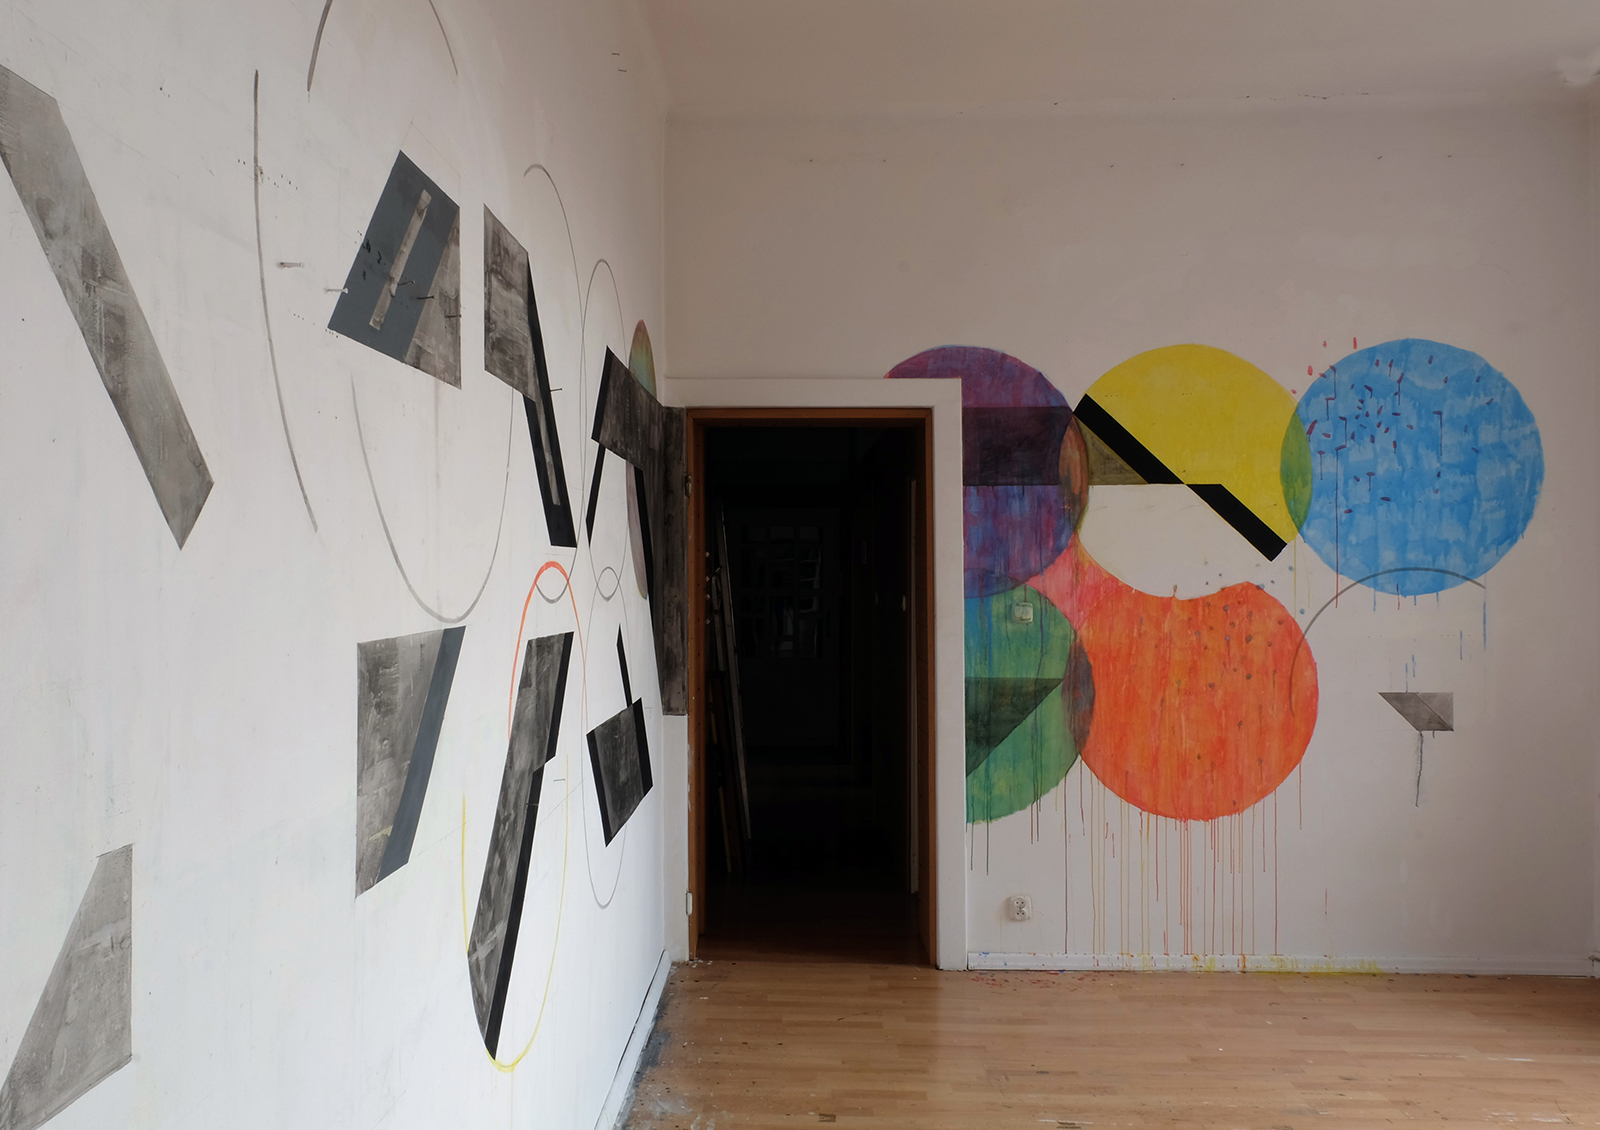 rusin-blazej-serhii-torbinov-peace-project-08